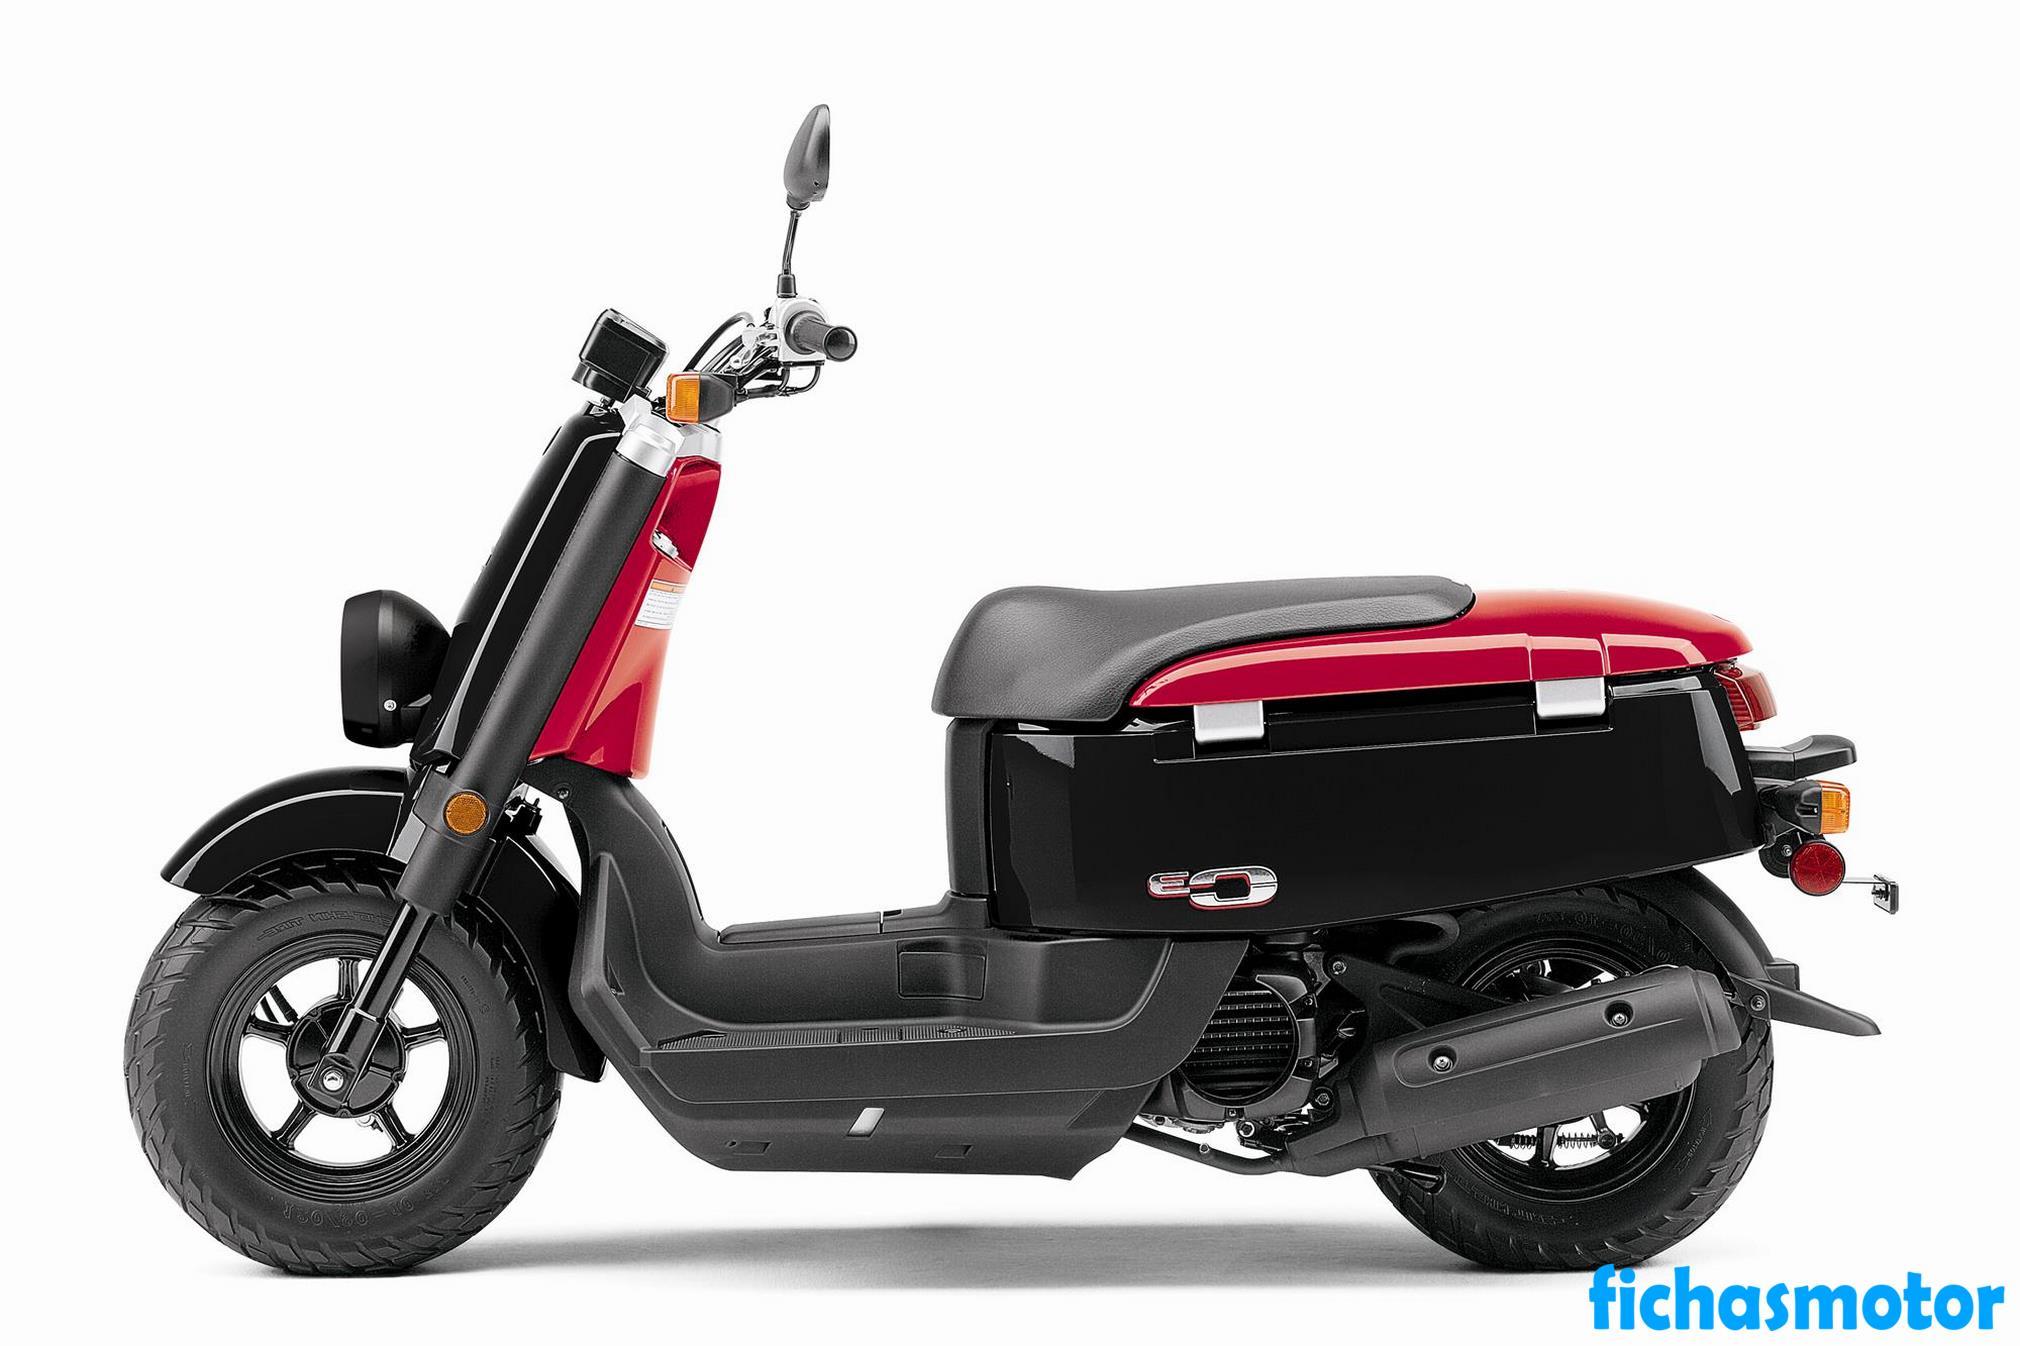 Imagen moto Yamaha c3 año 2012